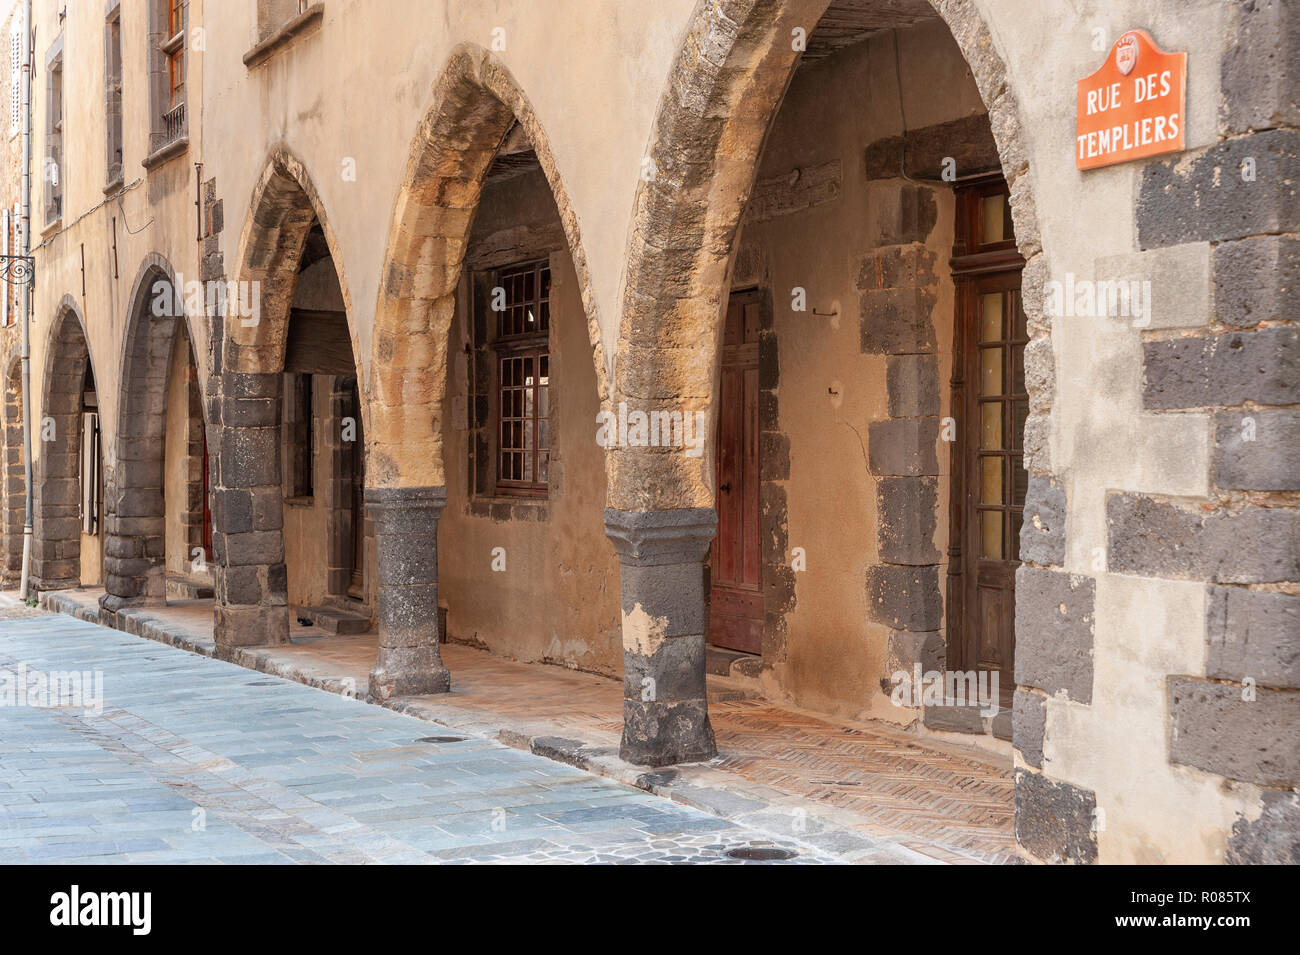 Arcades in the historic Rue des Templiers, Grimaud-Village, Var, Provence-Alpes-Cote d`Azur, France, Europe - Stock Image